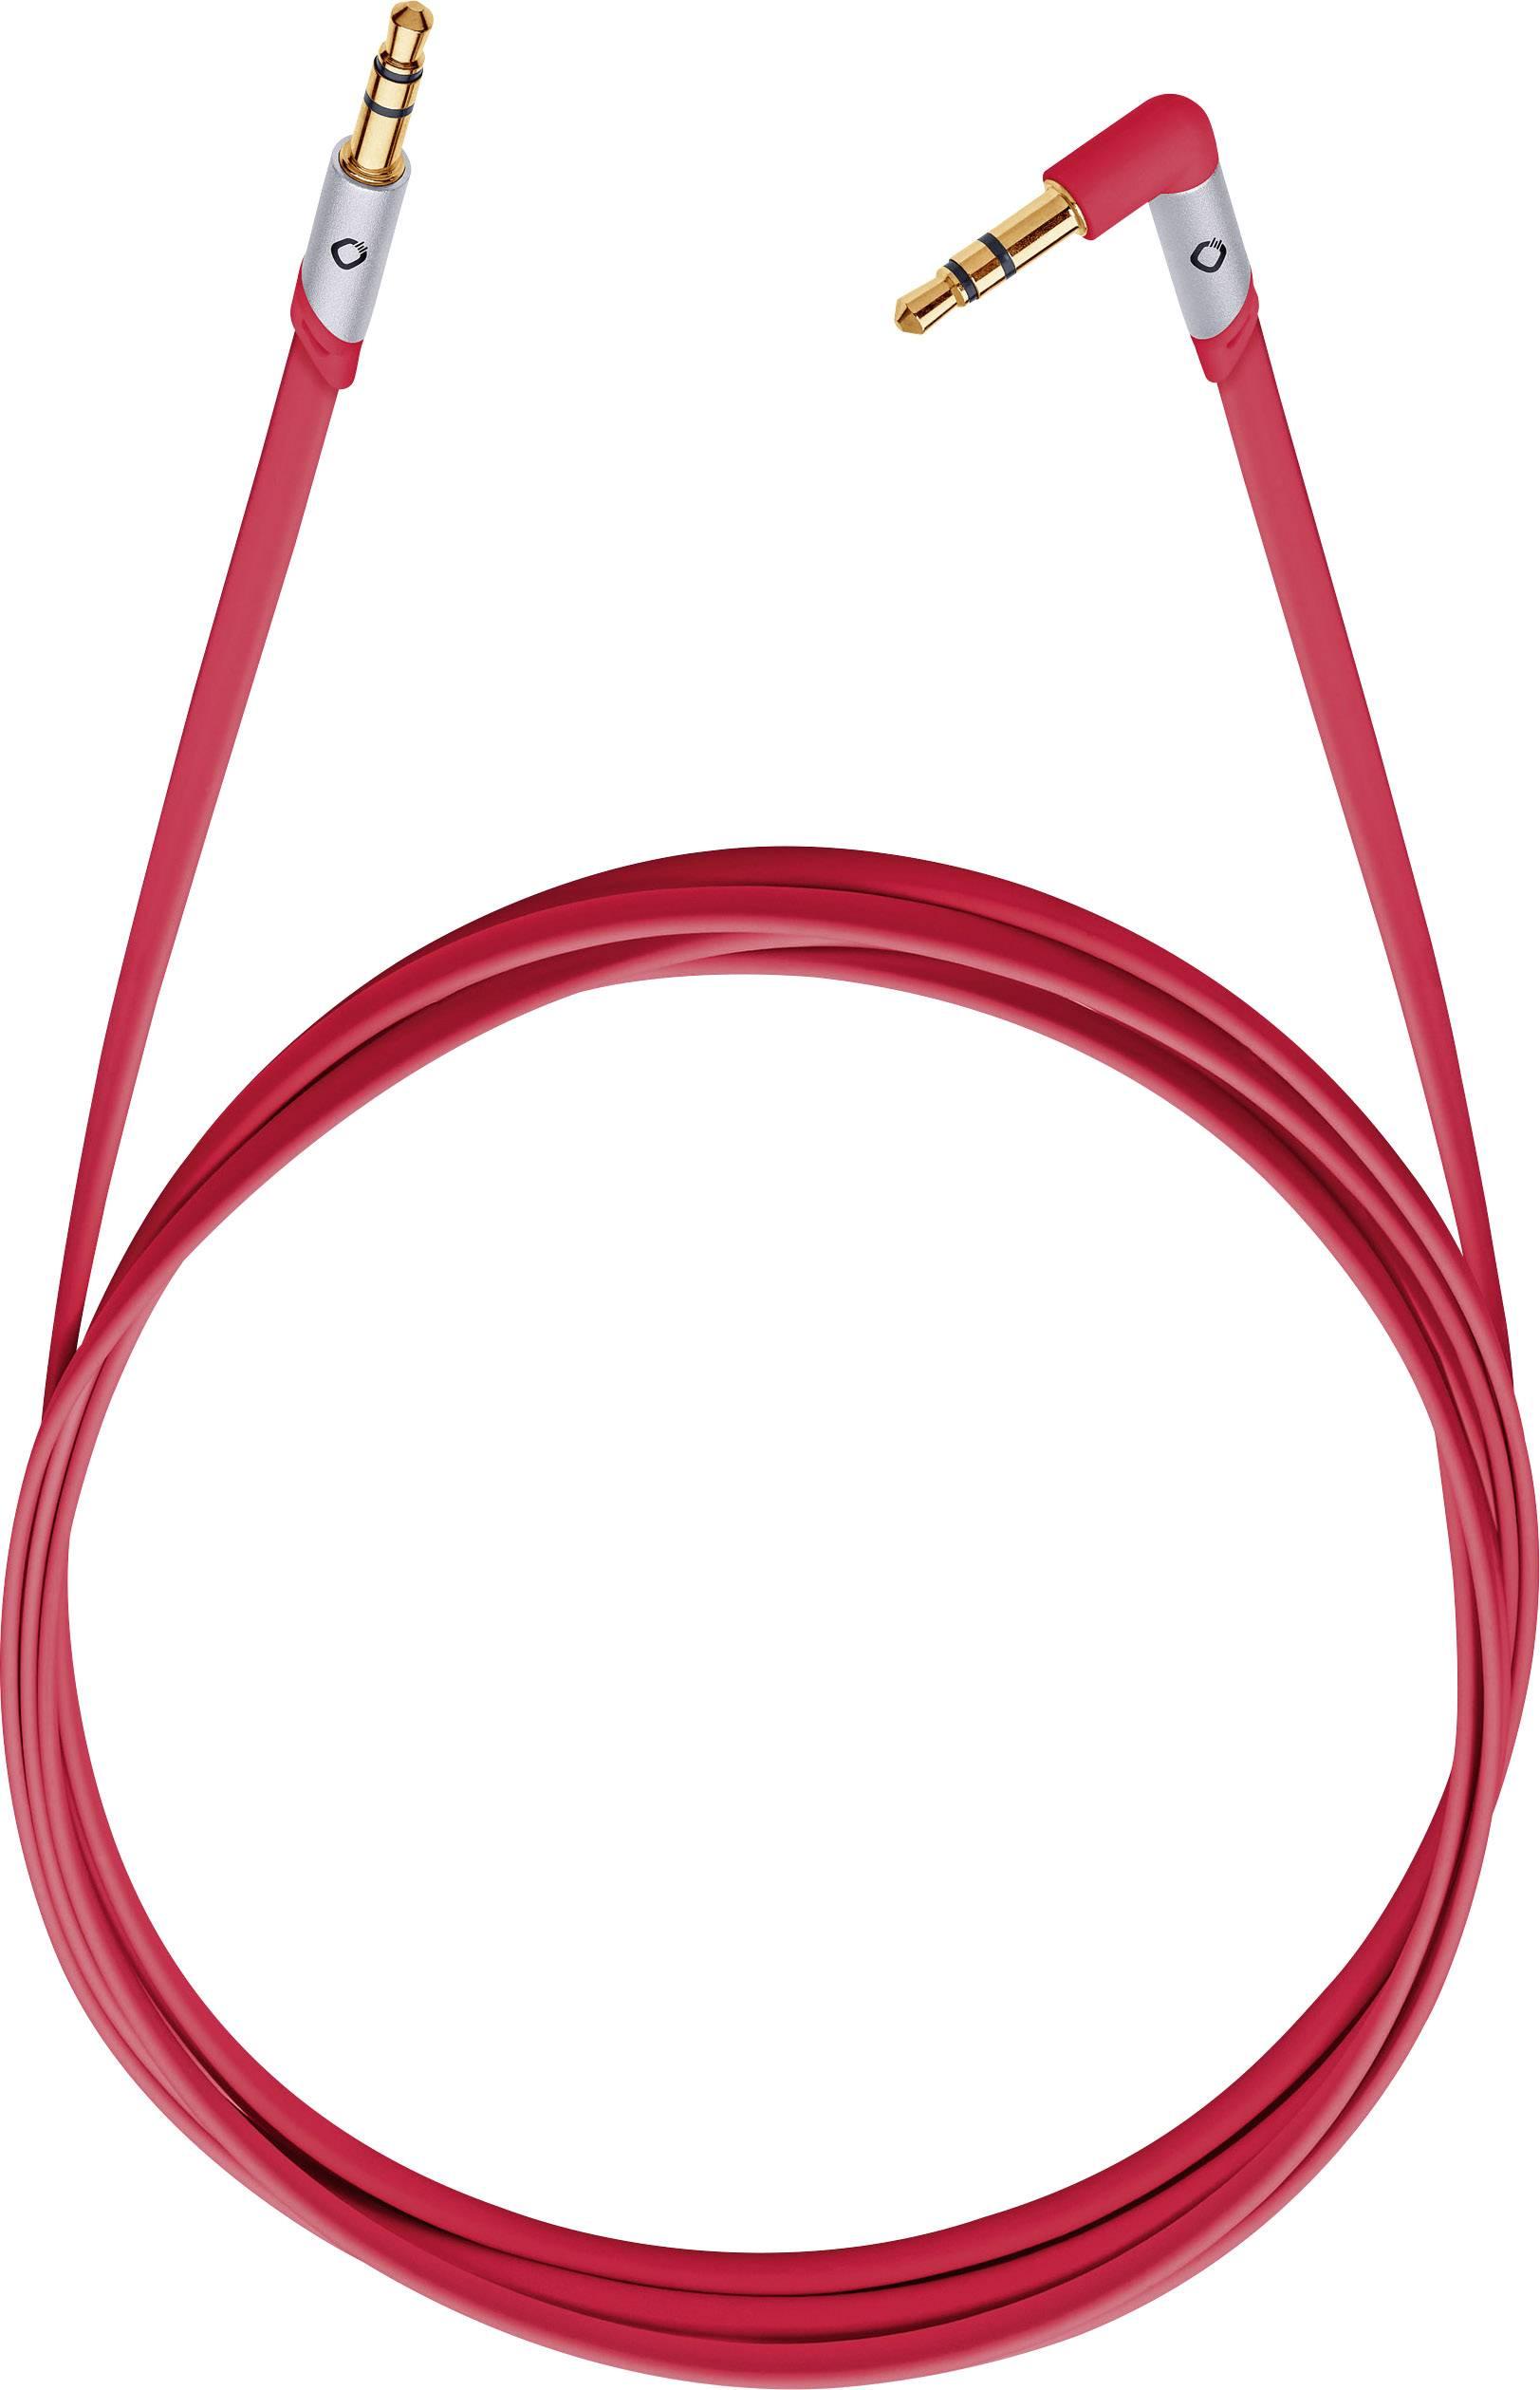 Jack audio kábel Oehlbach iJack 35 35005, 1.50 m, červená